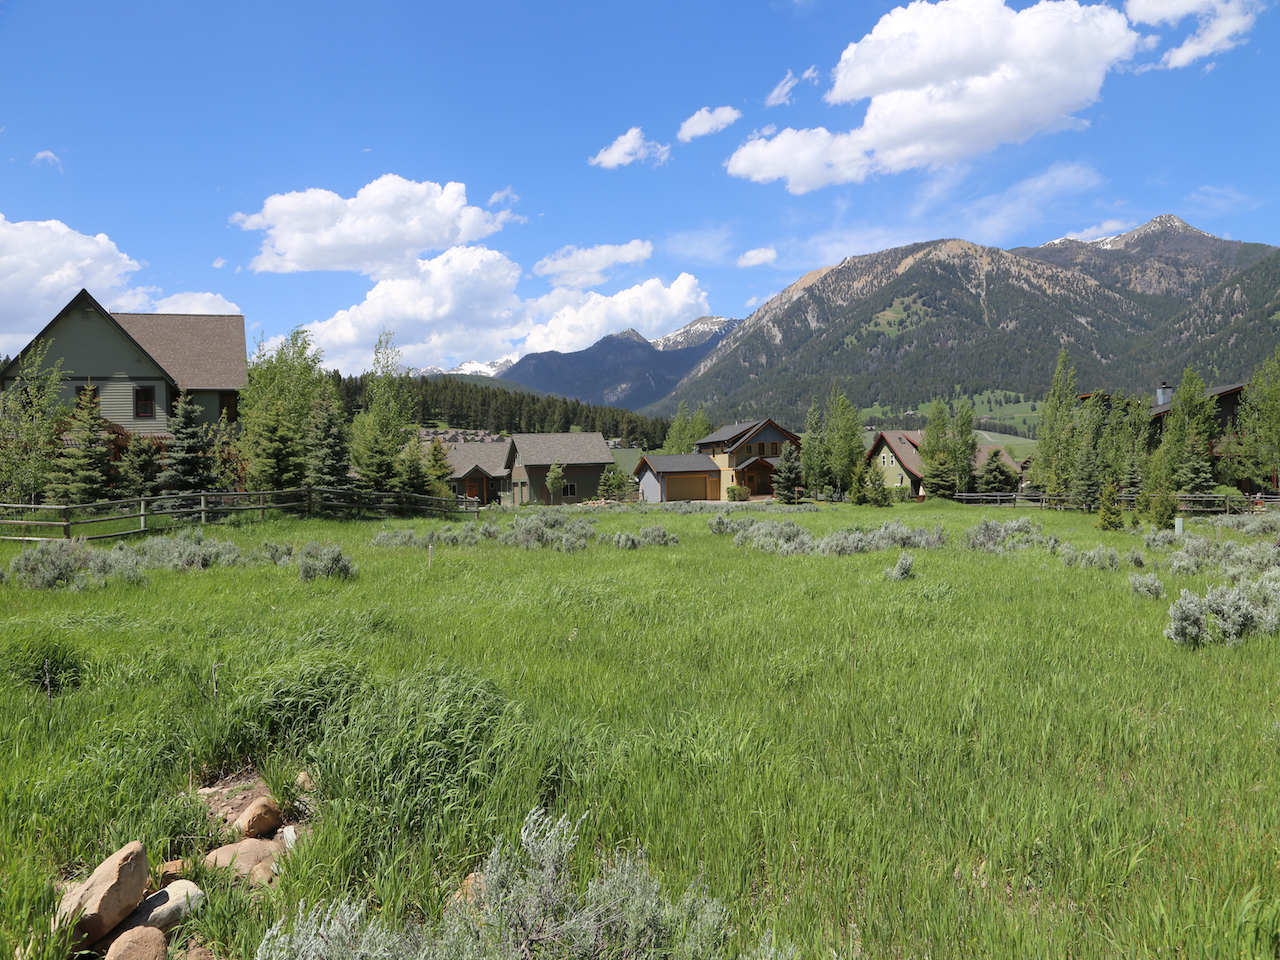 Land for Sale at Southfork Homesite White Bark Place Lot 35 Big Sky, Montana, 59716 United States